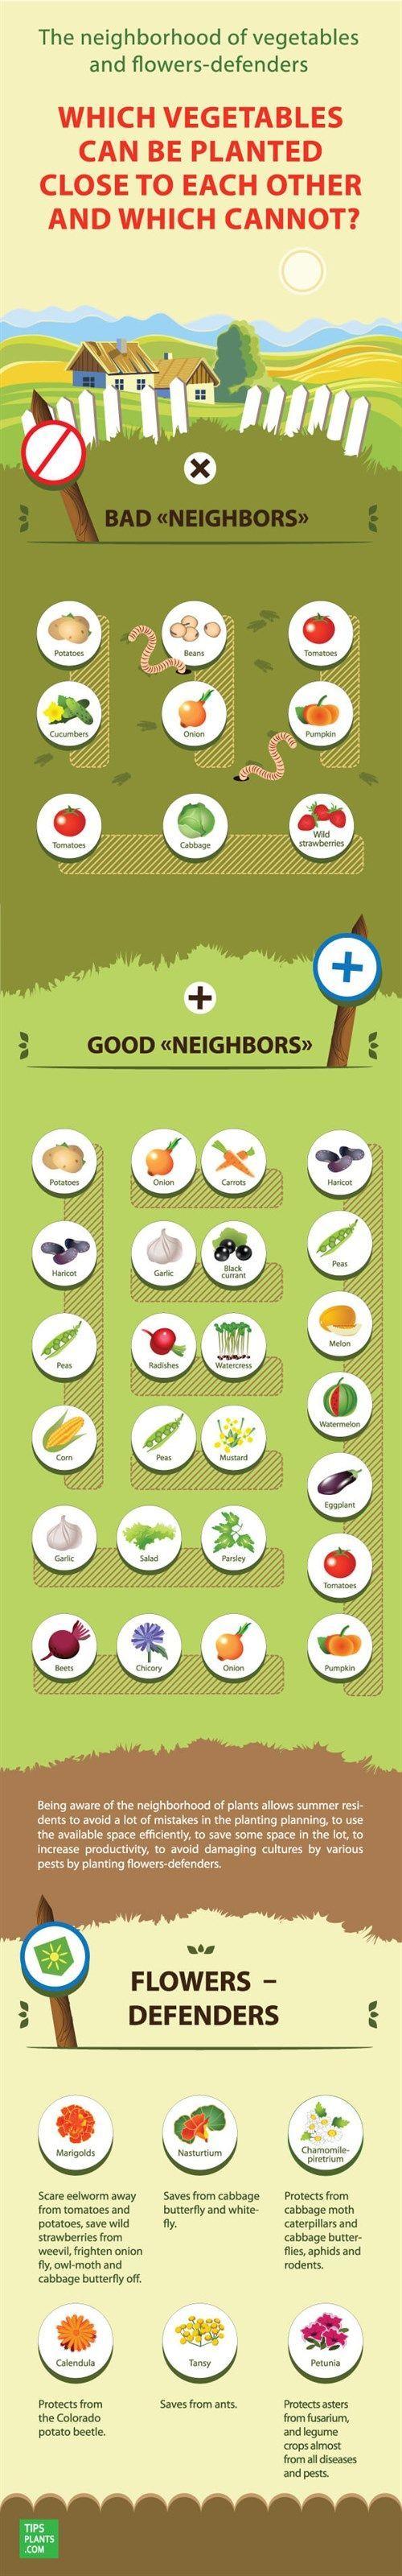 Companion Planting Infographic (1)